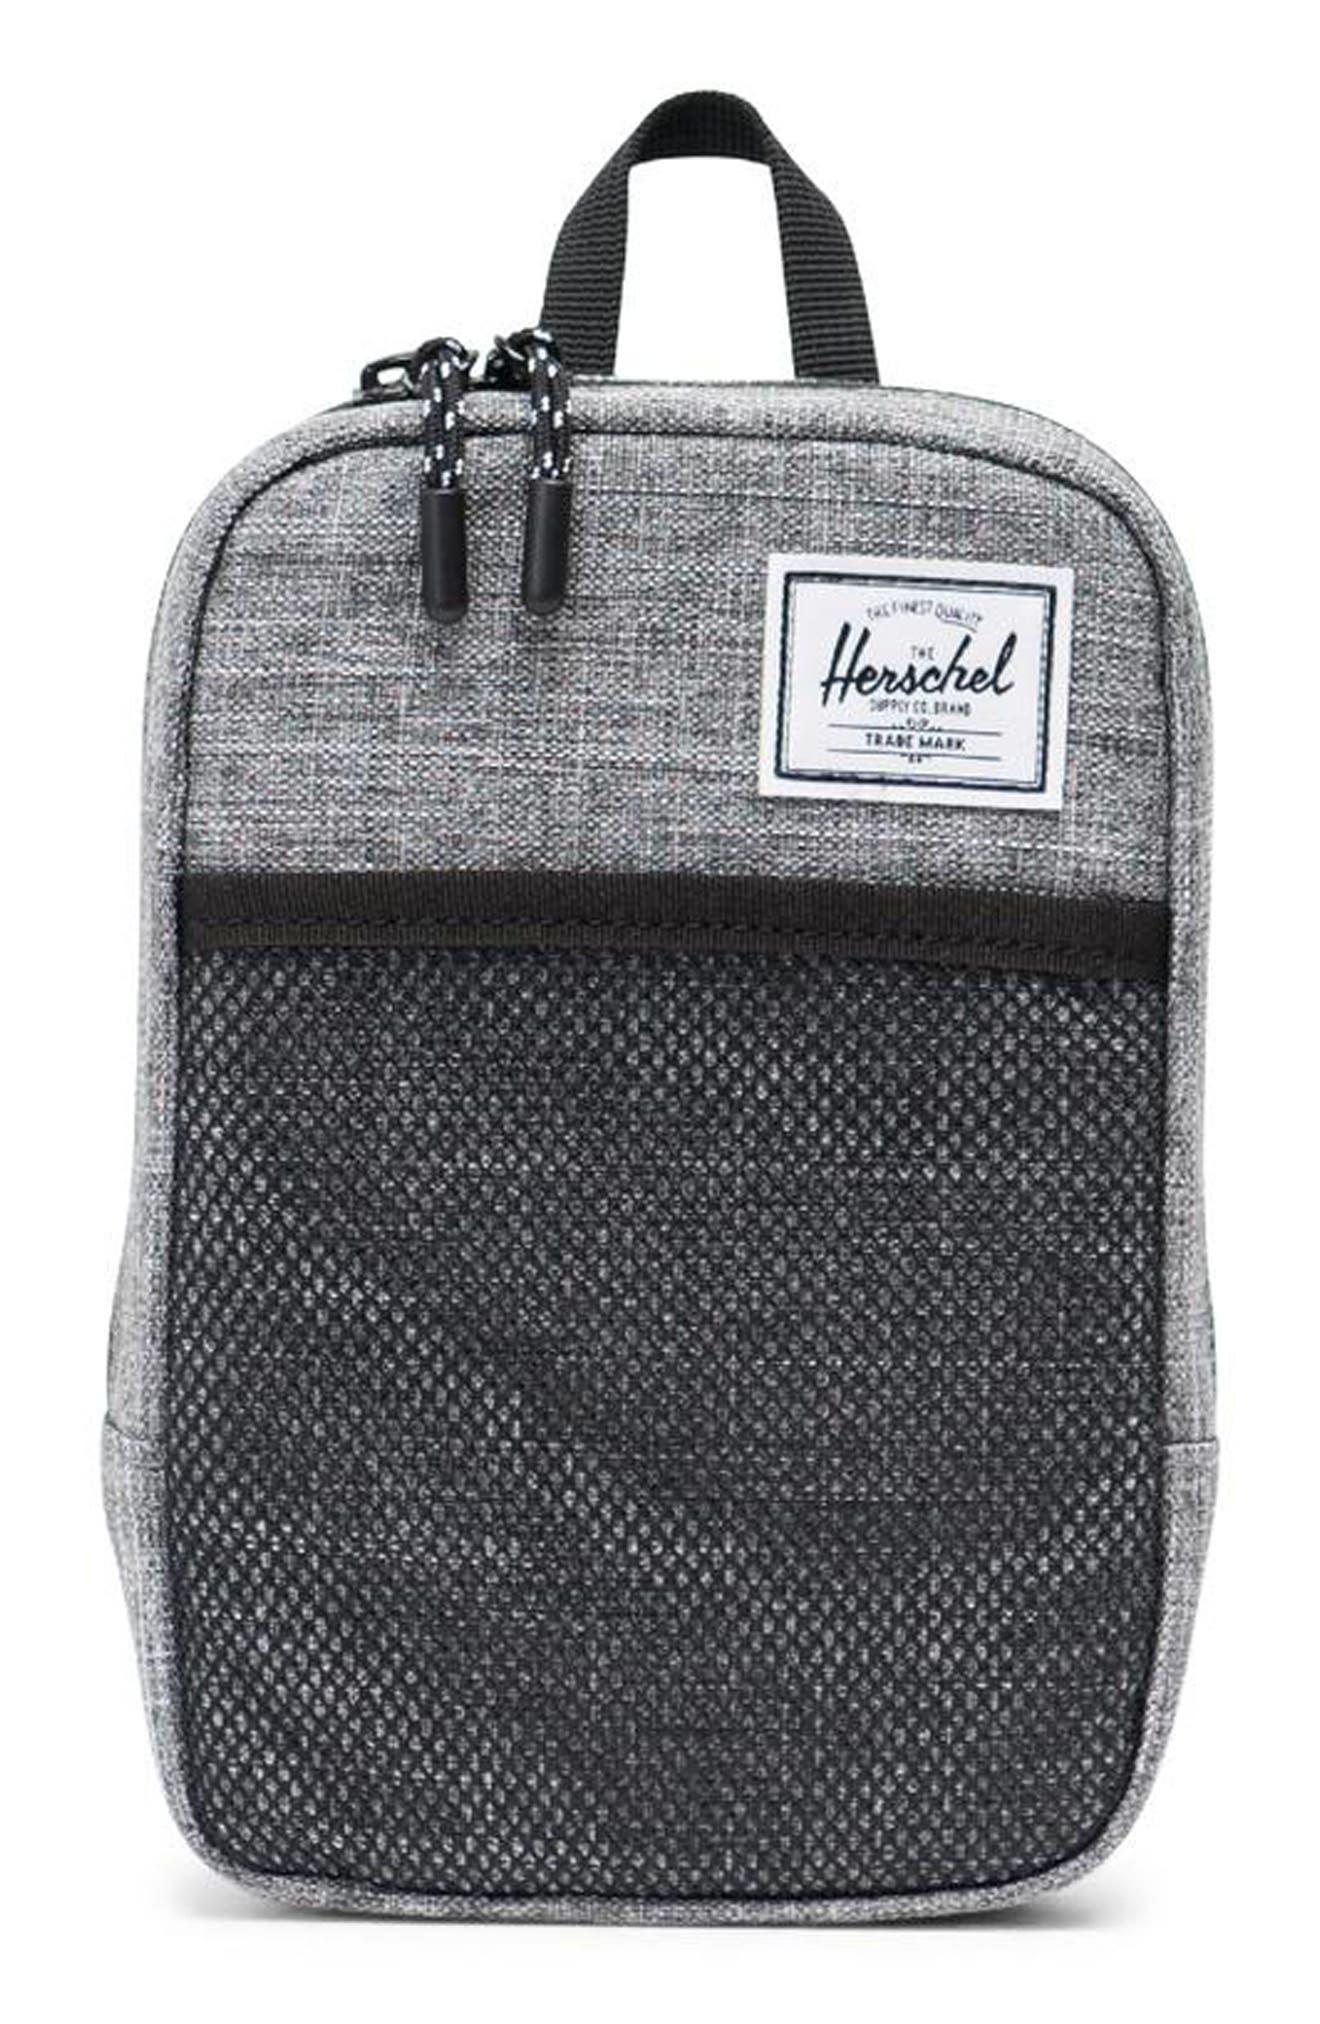 Large Sinclair Crossbody Bag